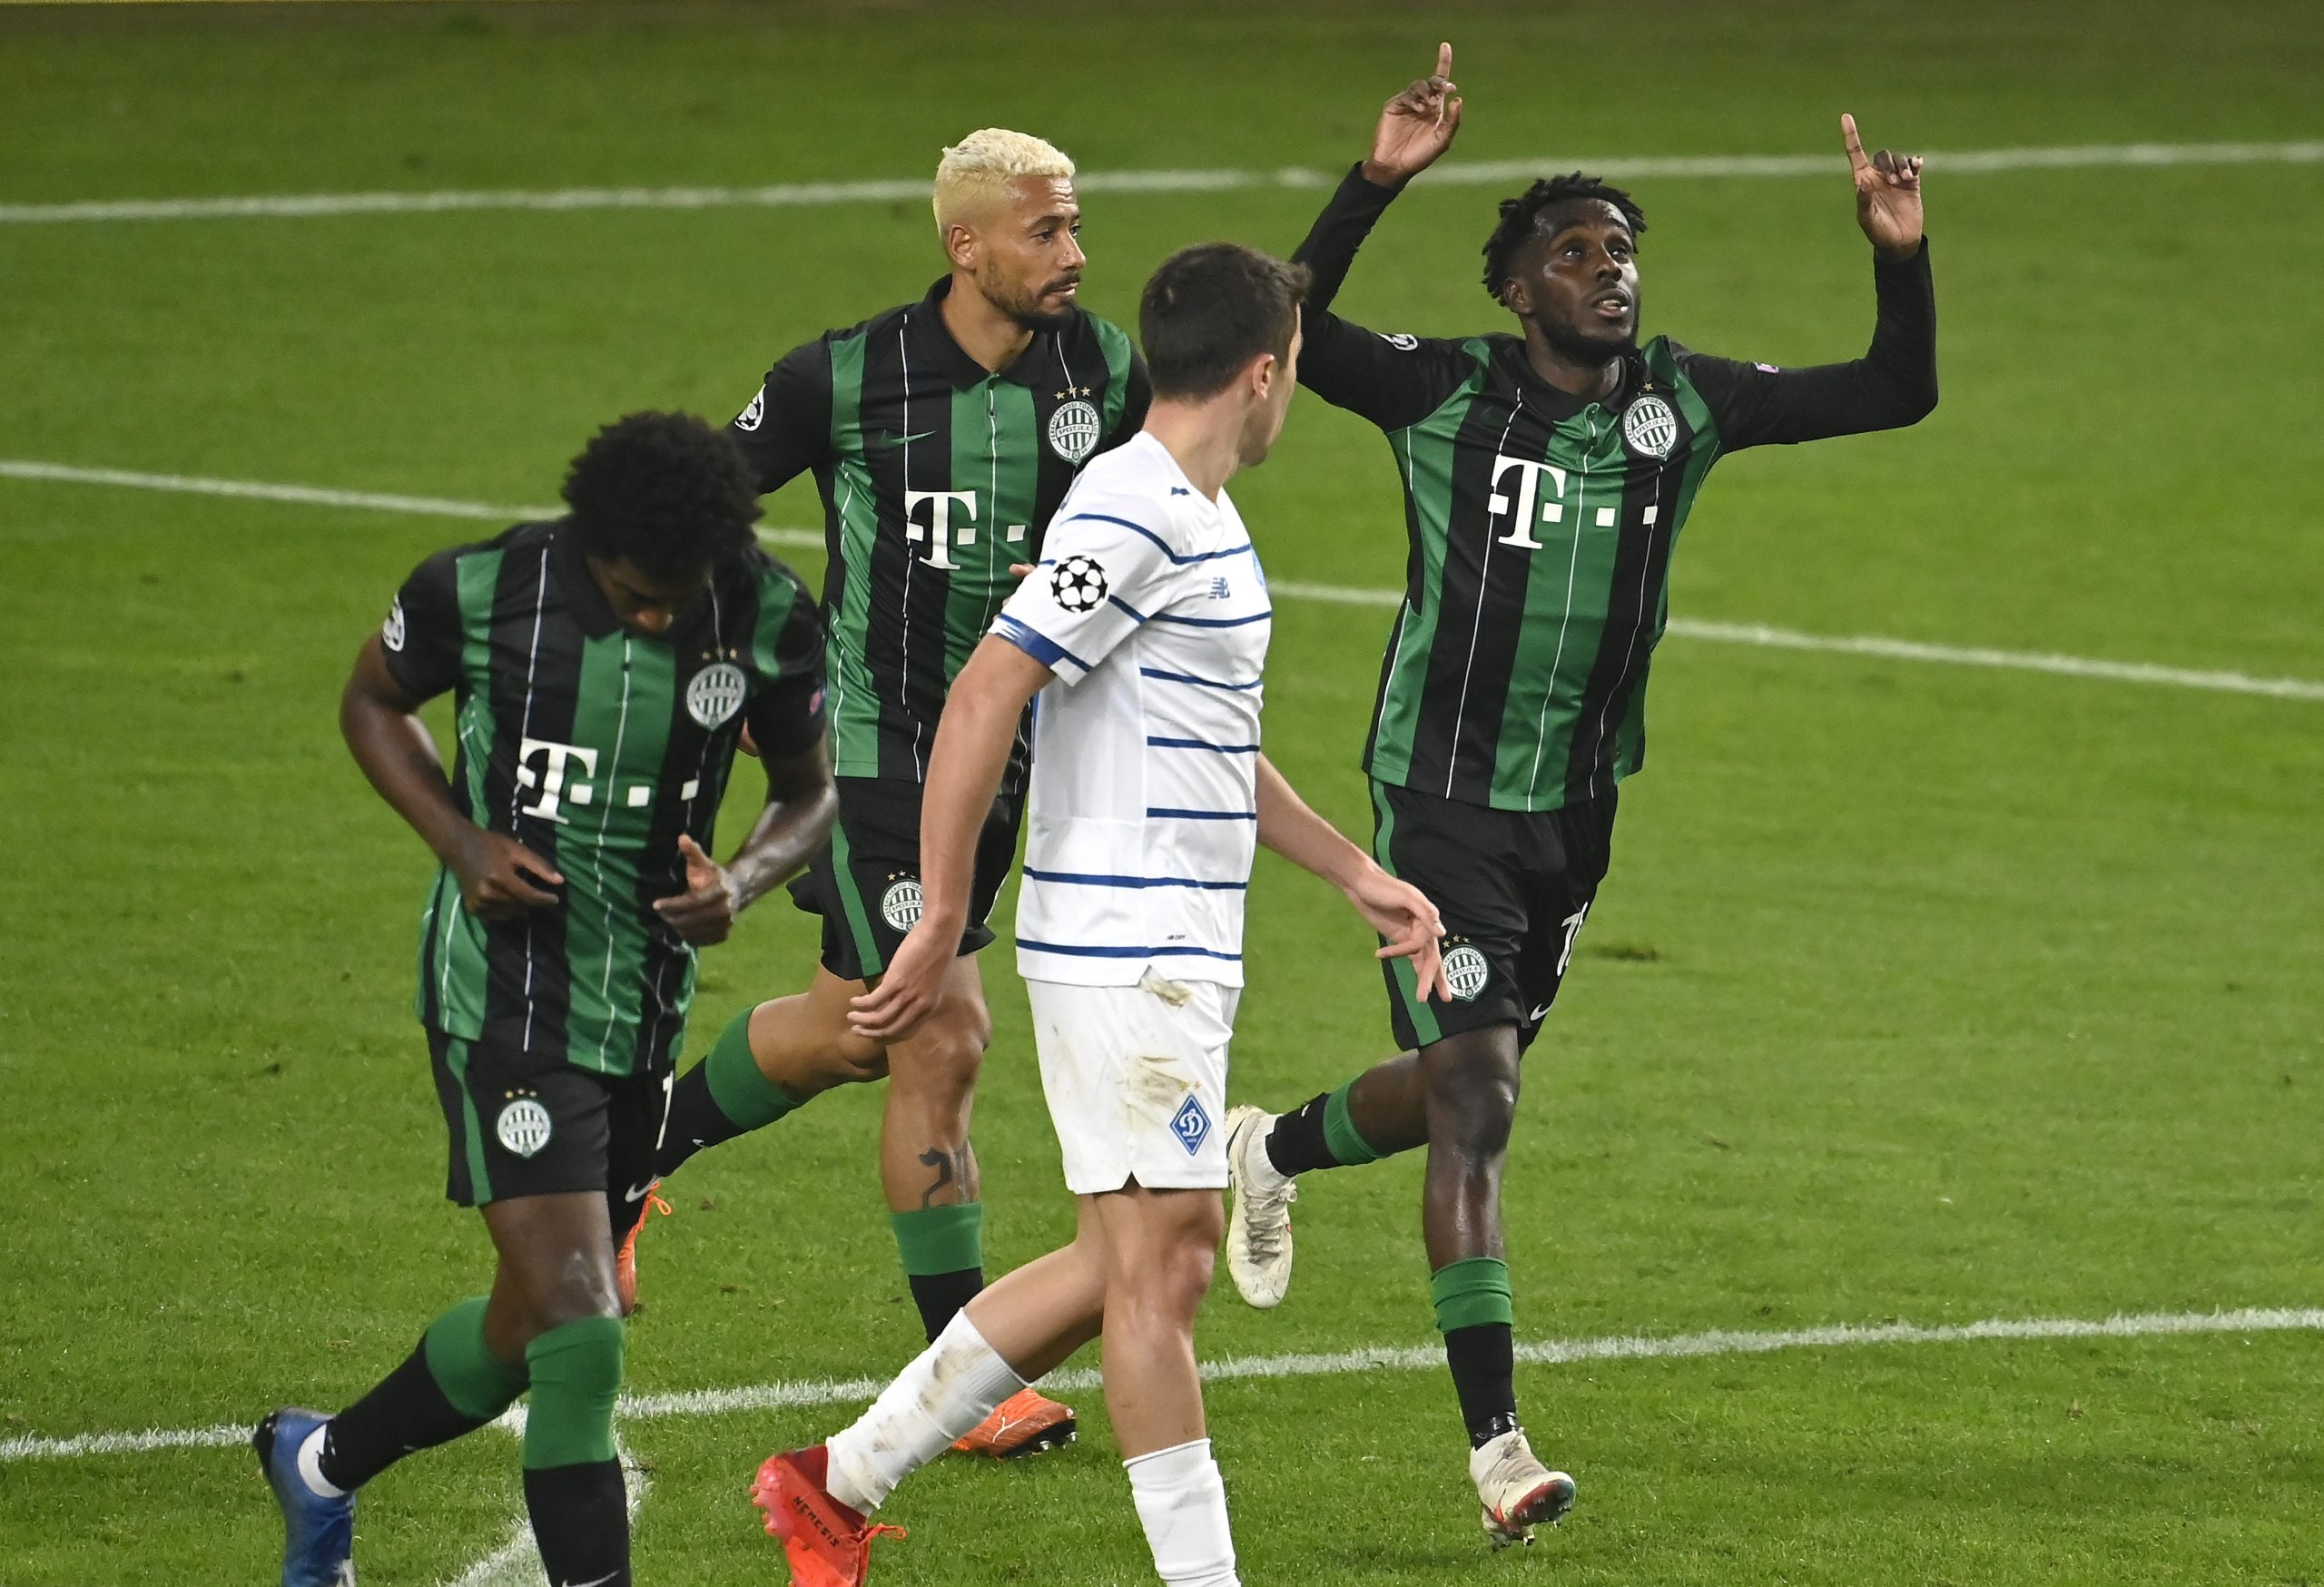 Ferencváros erzielt den ersten Champions League Punkt nach 25 Jahren